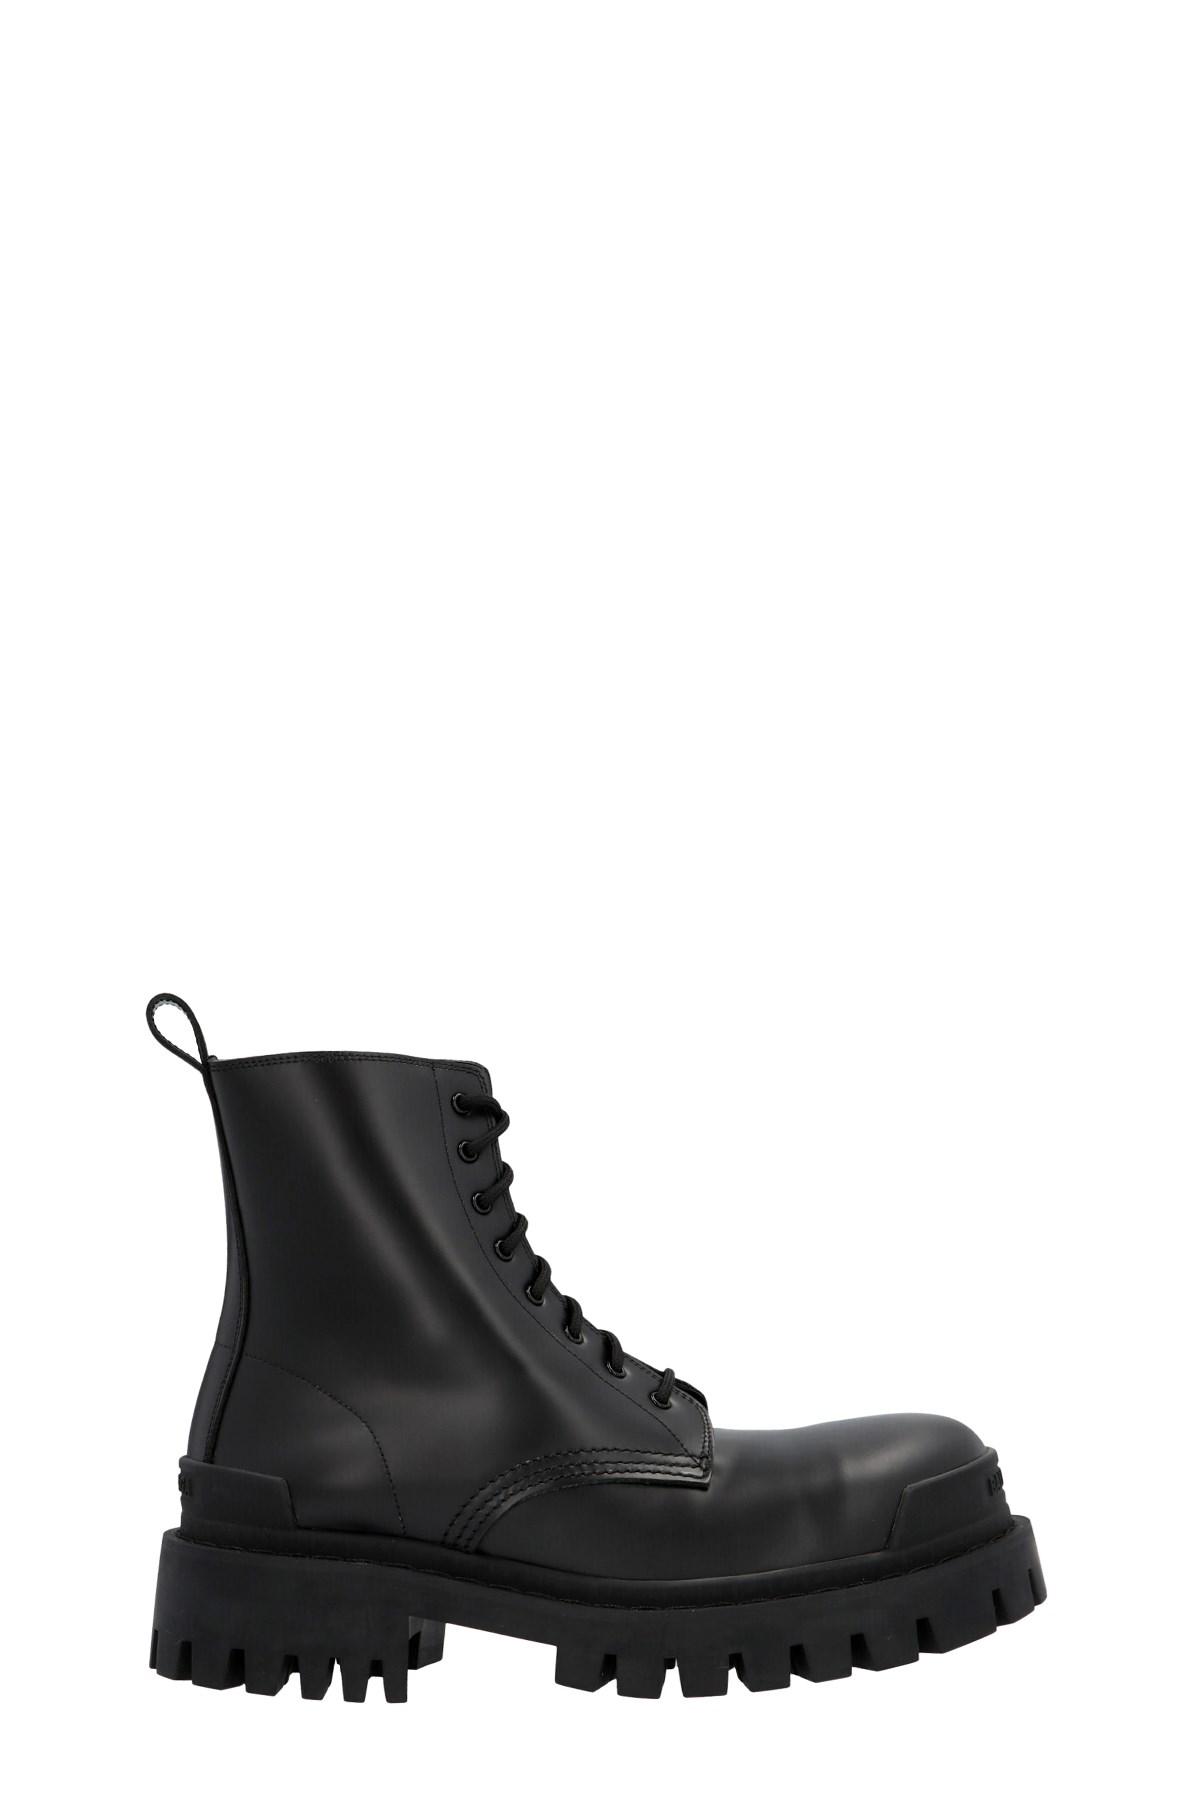 balenciaga 'Strike' combat boots